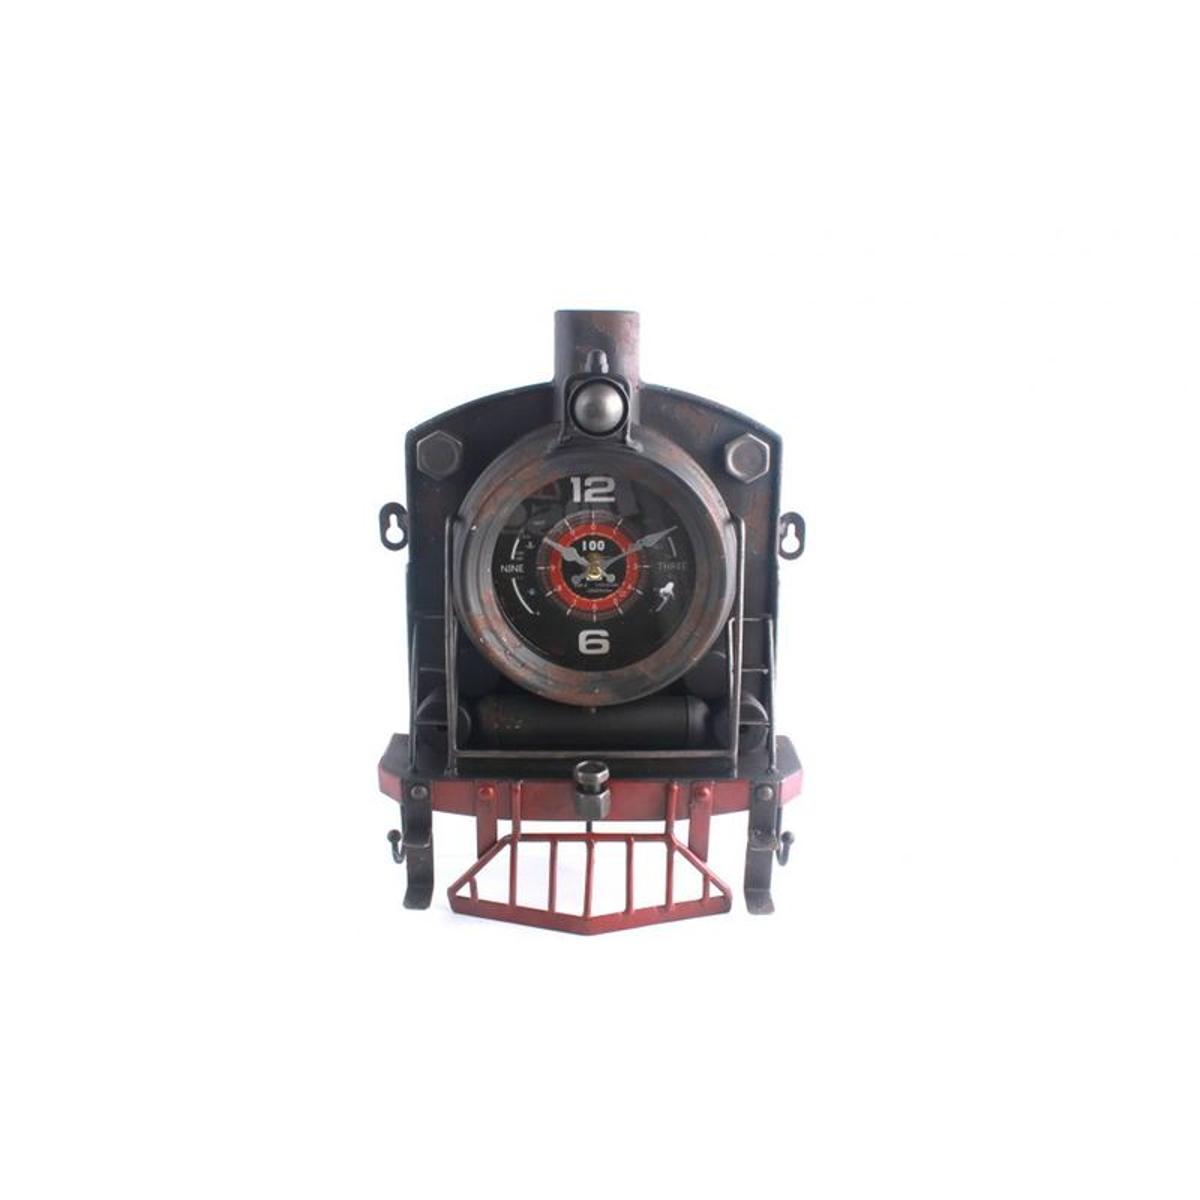 pier import horloge poser rtro locomotive en mtal vieilli 23x8xh33cm